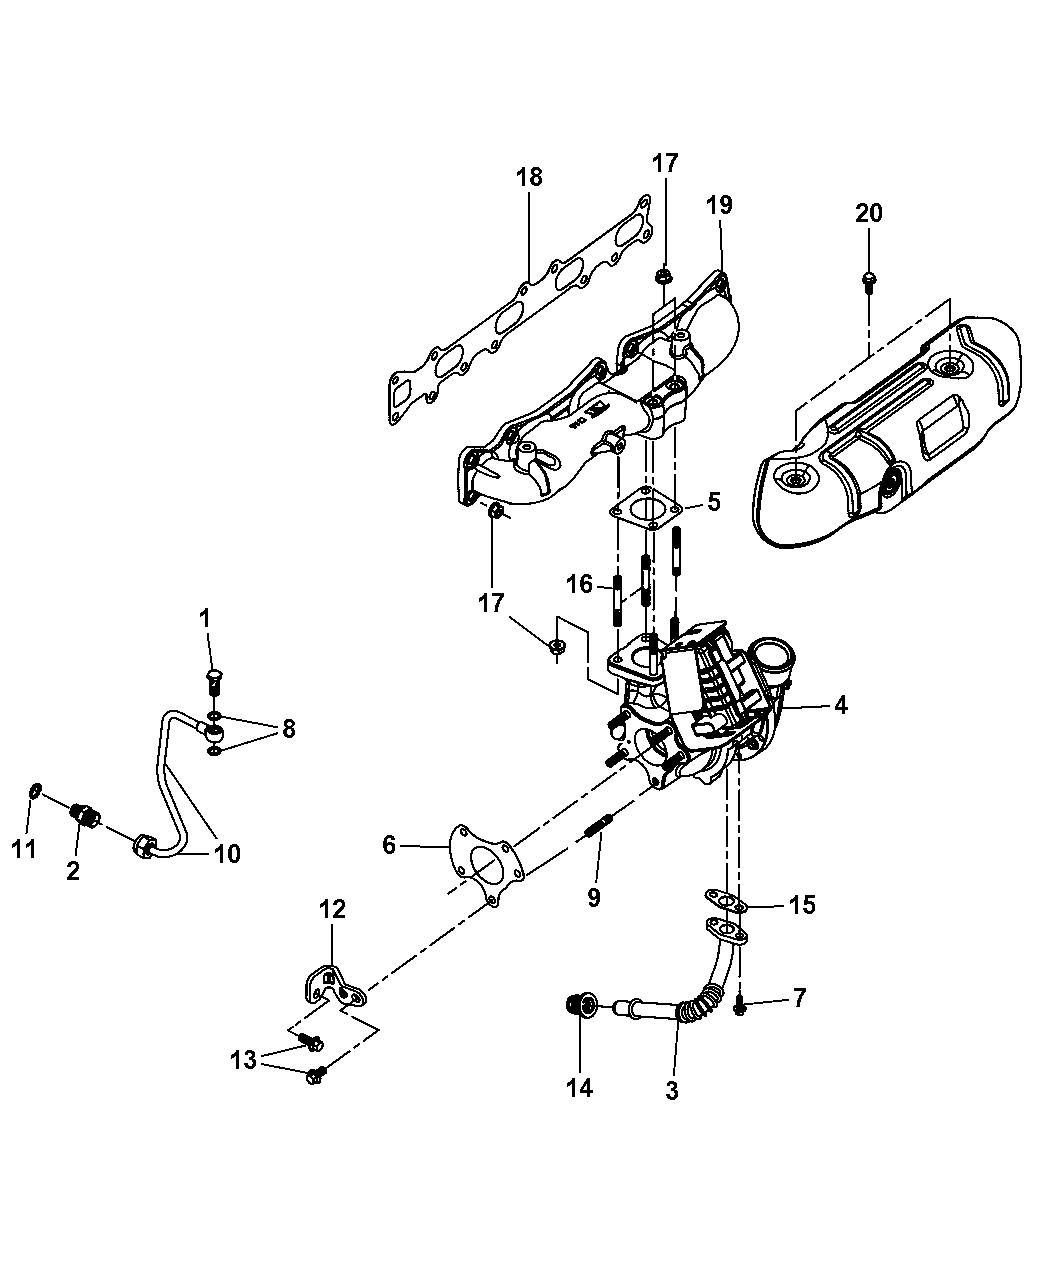 2011 Jeep Wrangler Turbo Charger Oil Hoses Tubes Engine Diagram